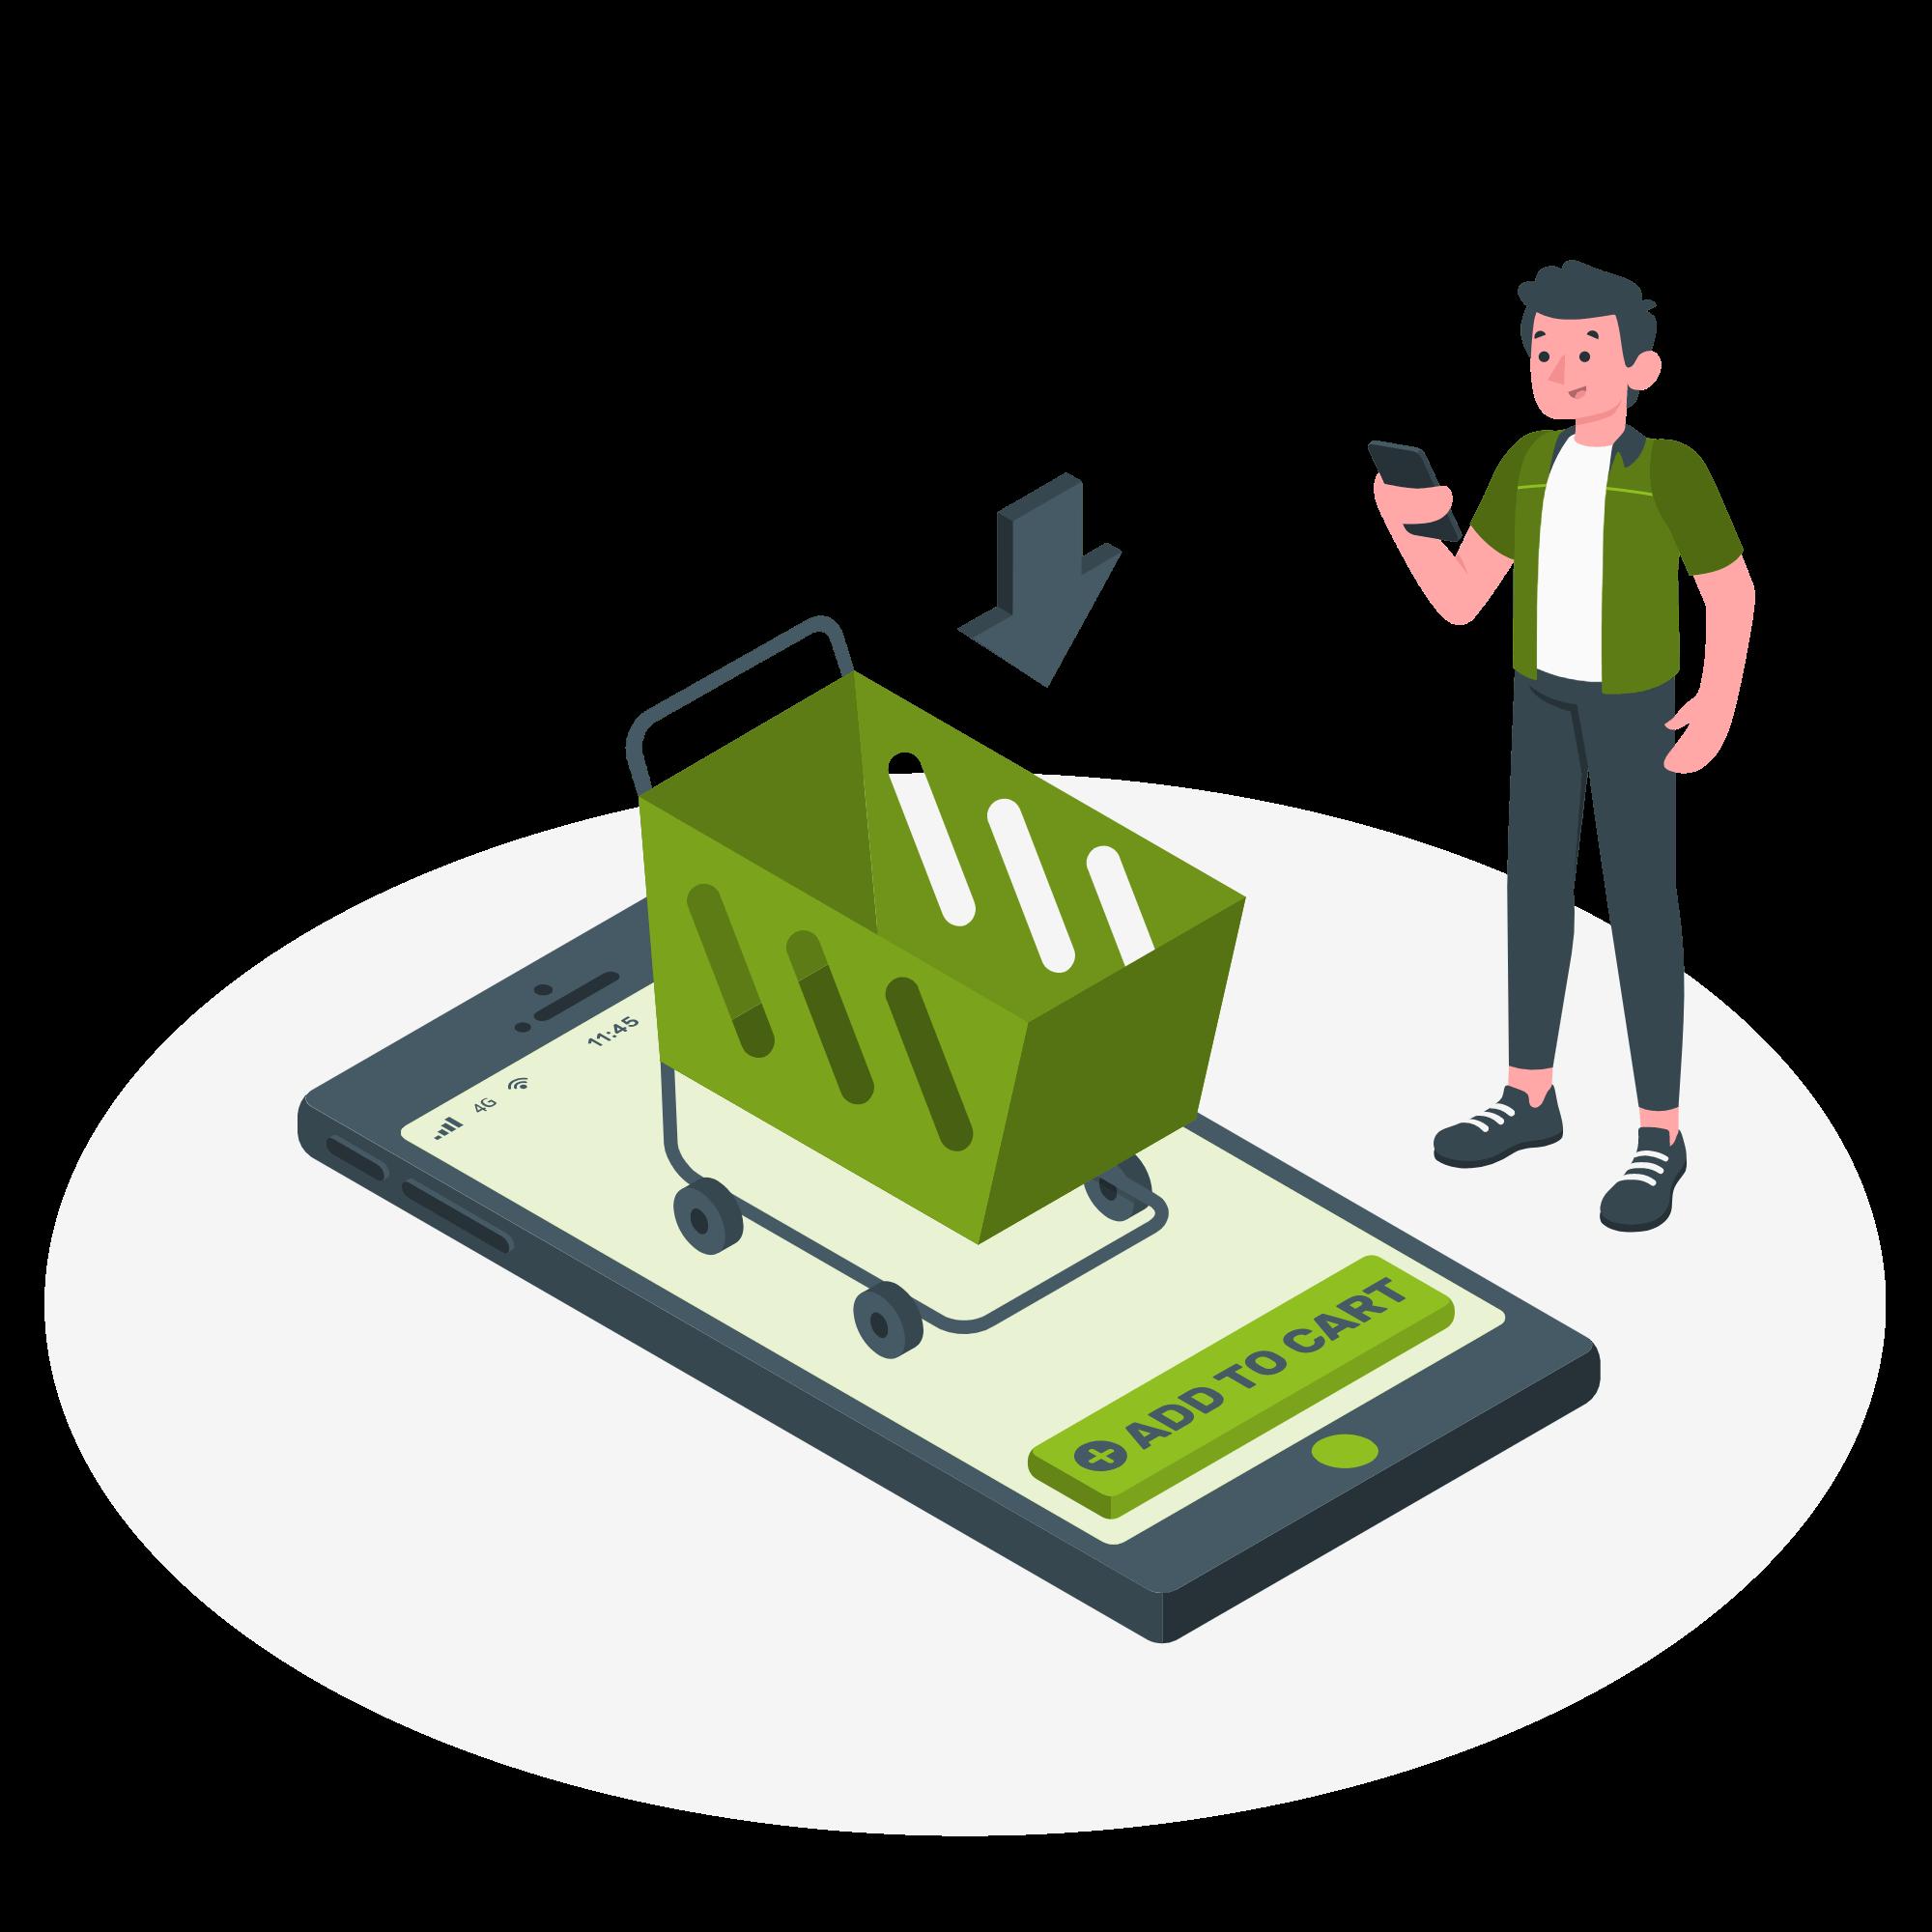 AmadeusGo - automatisch zum Webshop